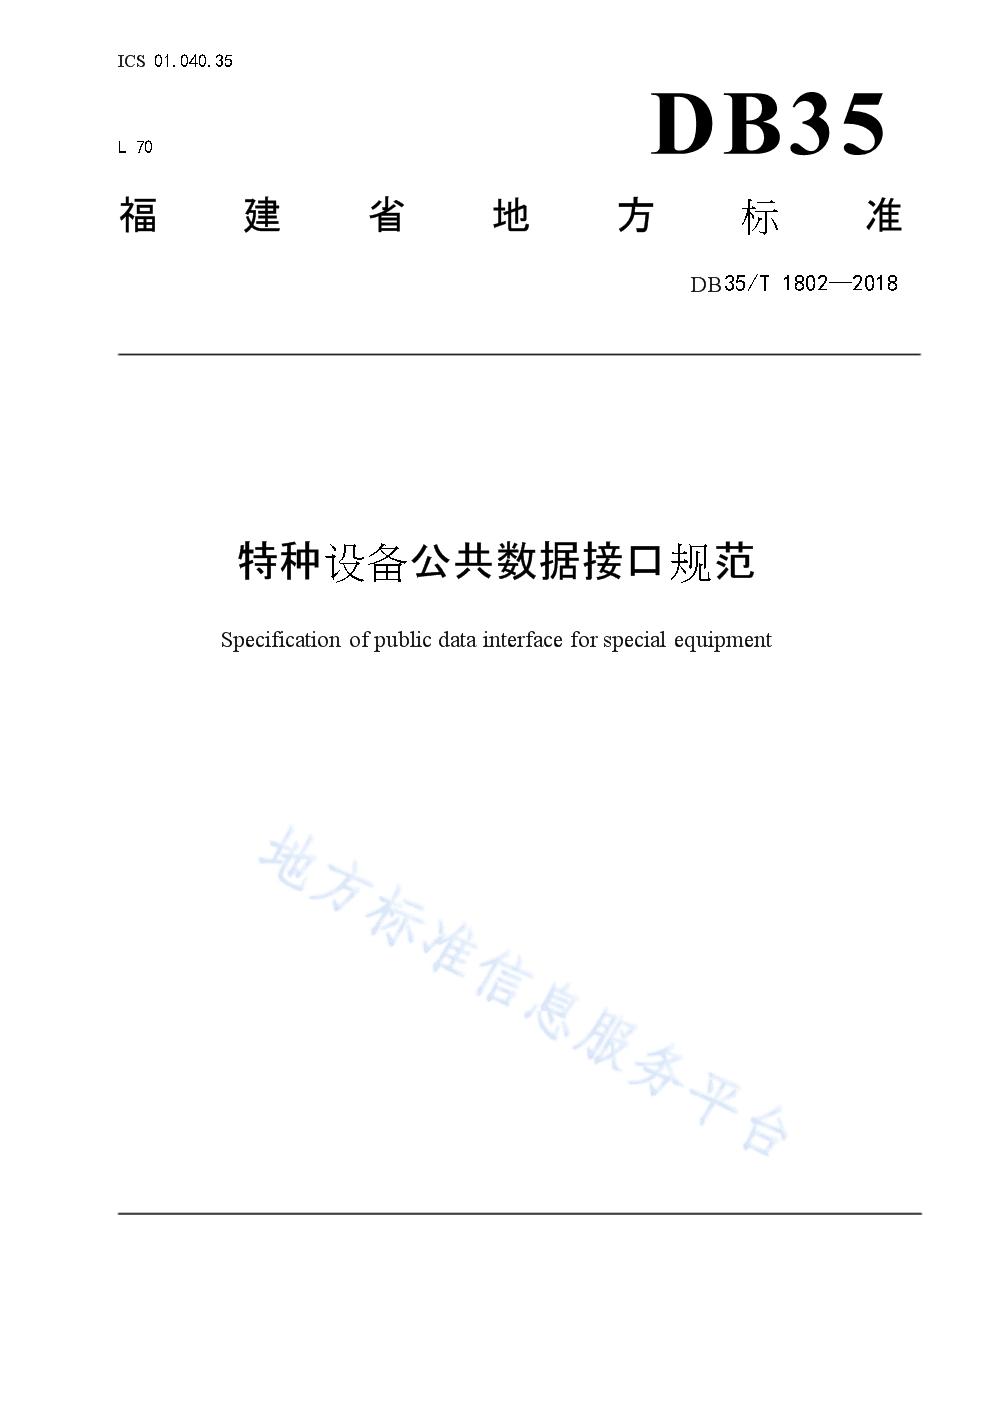 DB35_T 1802-2018特种设备公共数据接口规范.docx